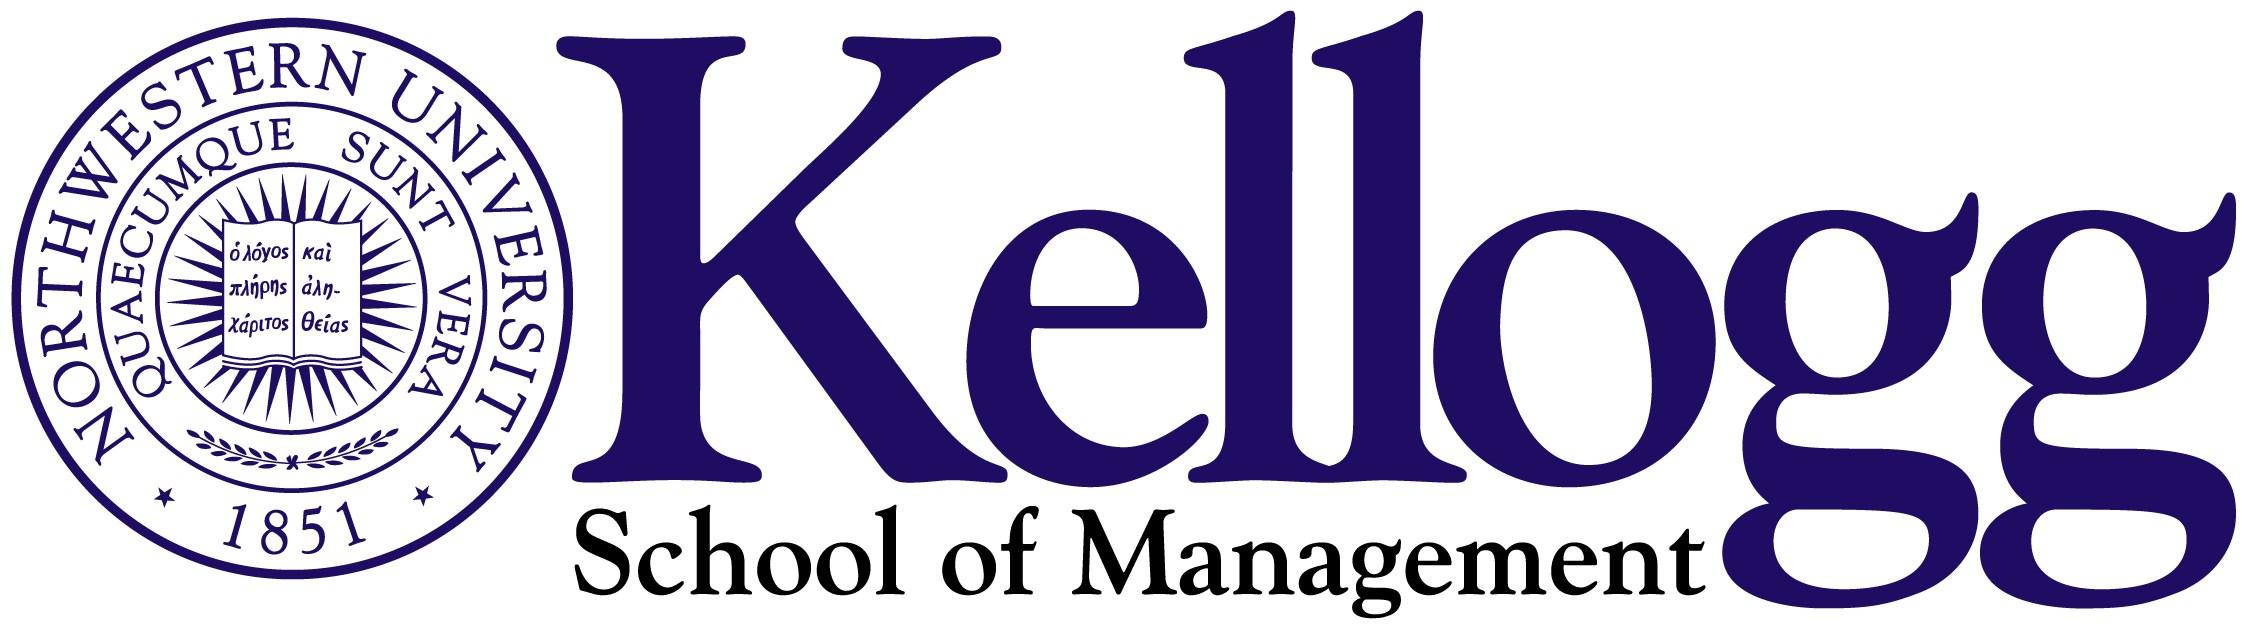 Northwestern-University-Kellogg-School-of-Management-Logo.jpg